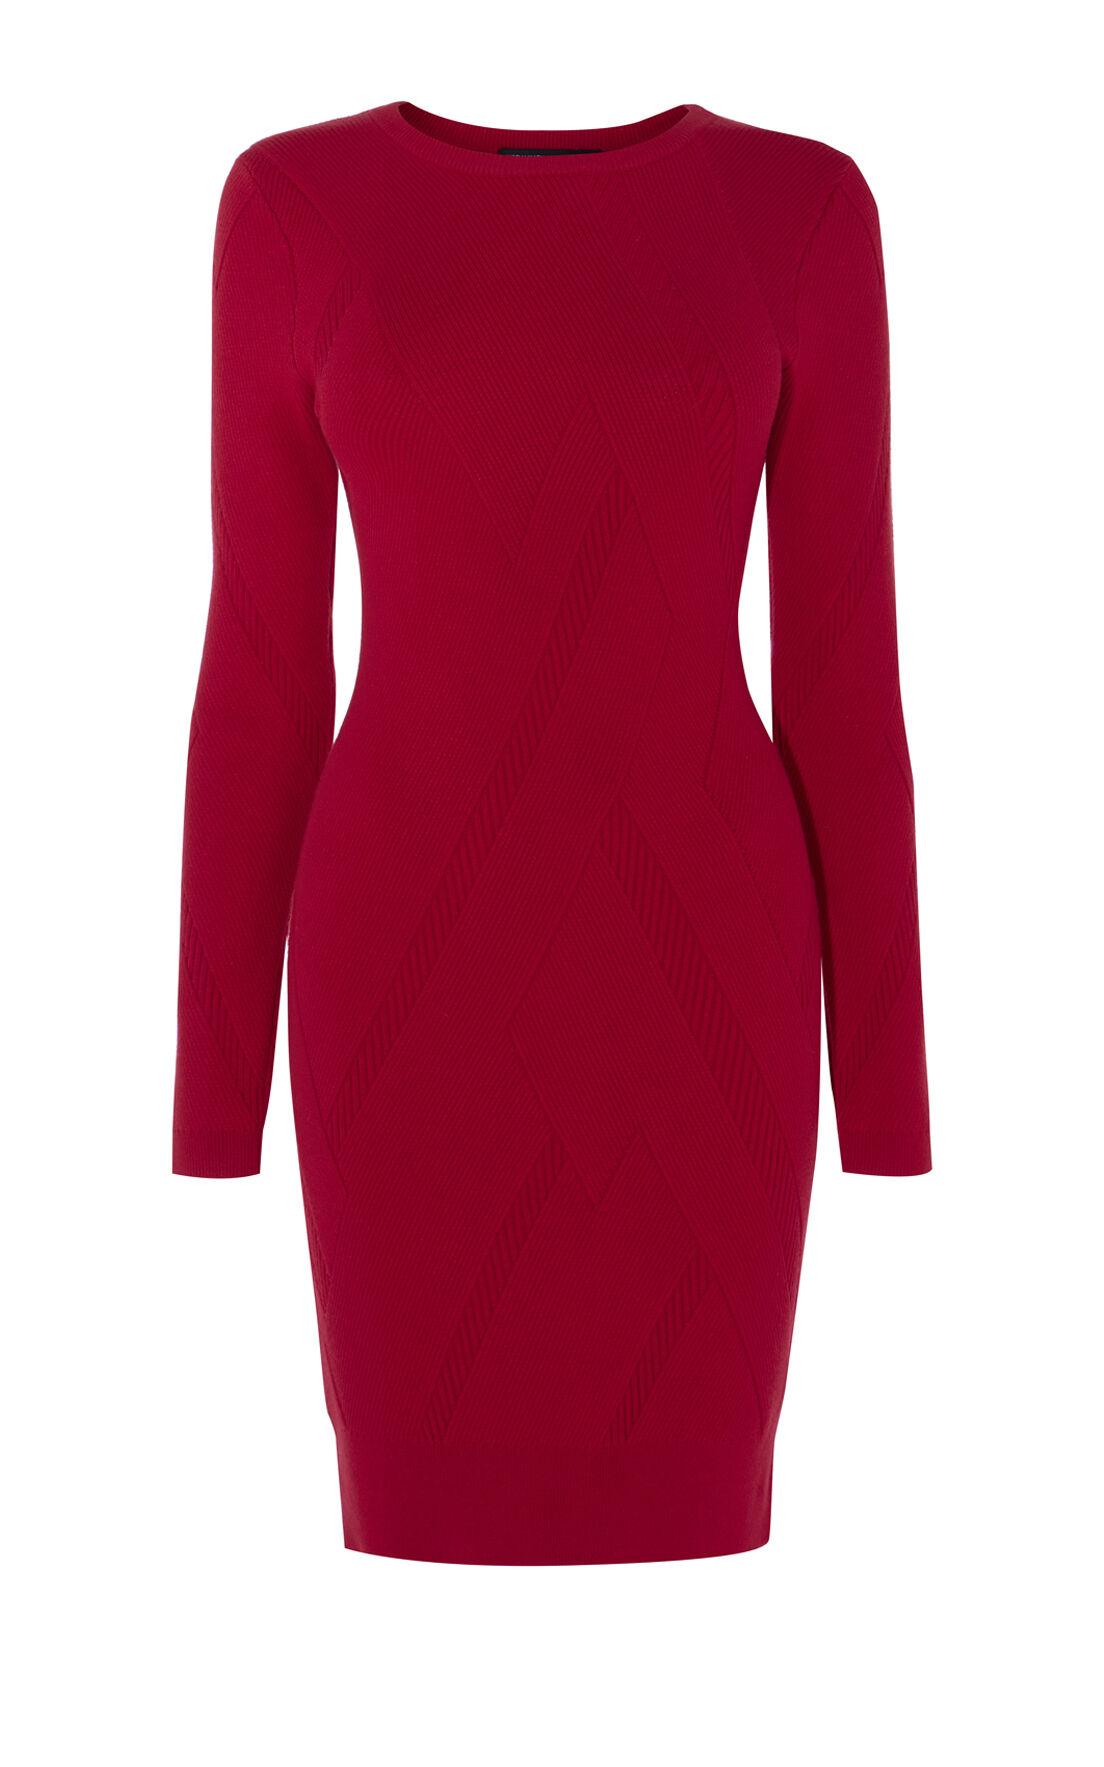 Karen Millen, GRAPHIC RIB DRESS Red 0